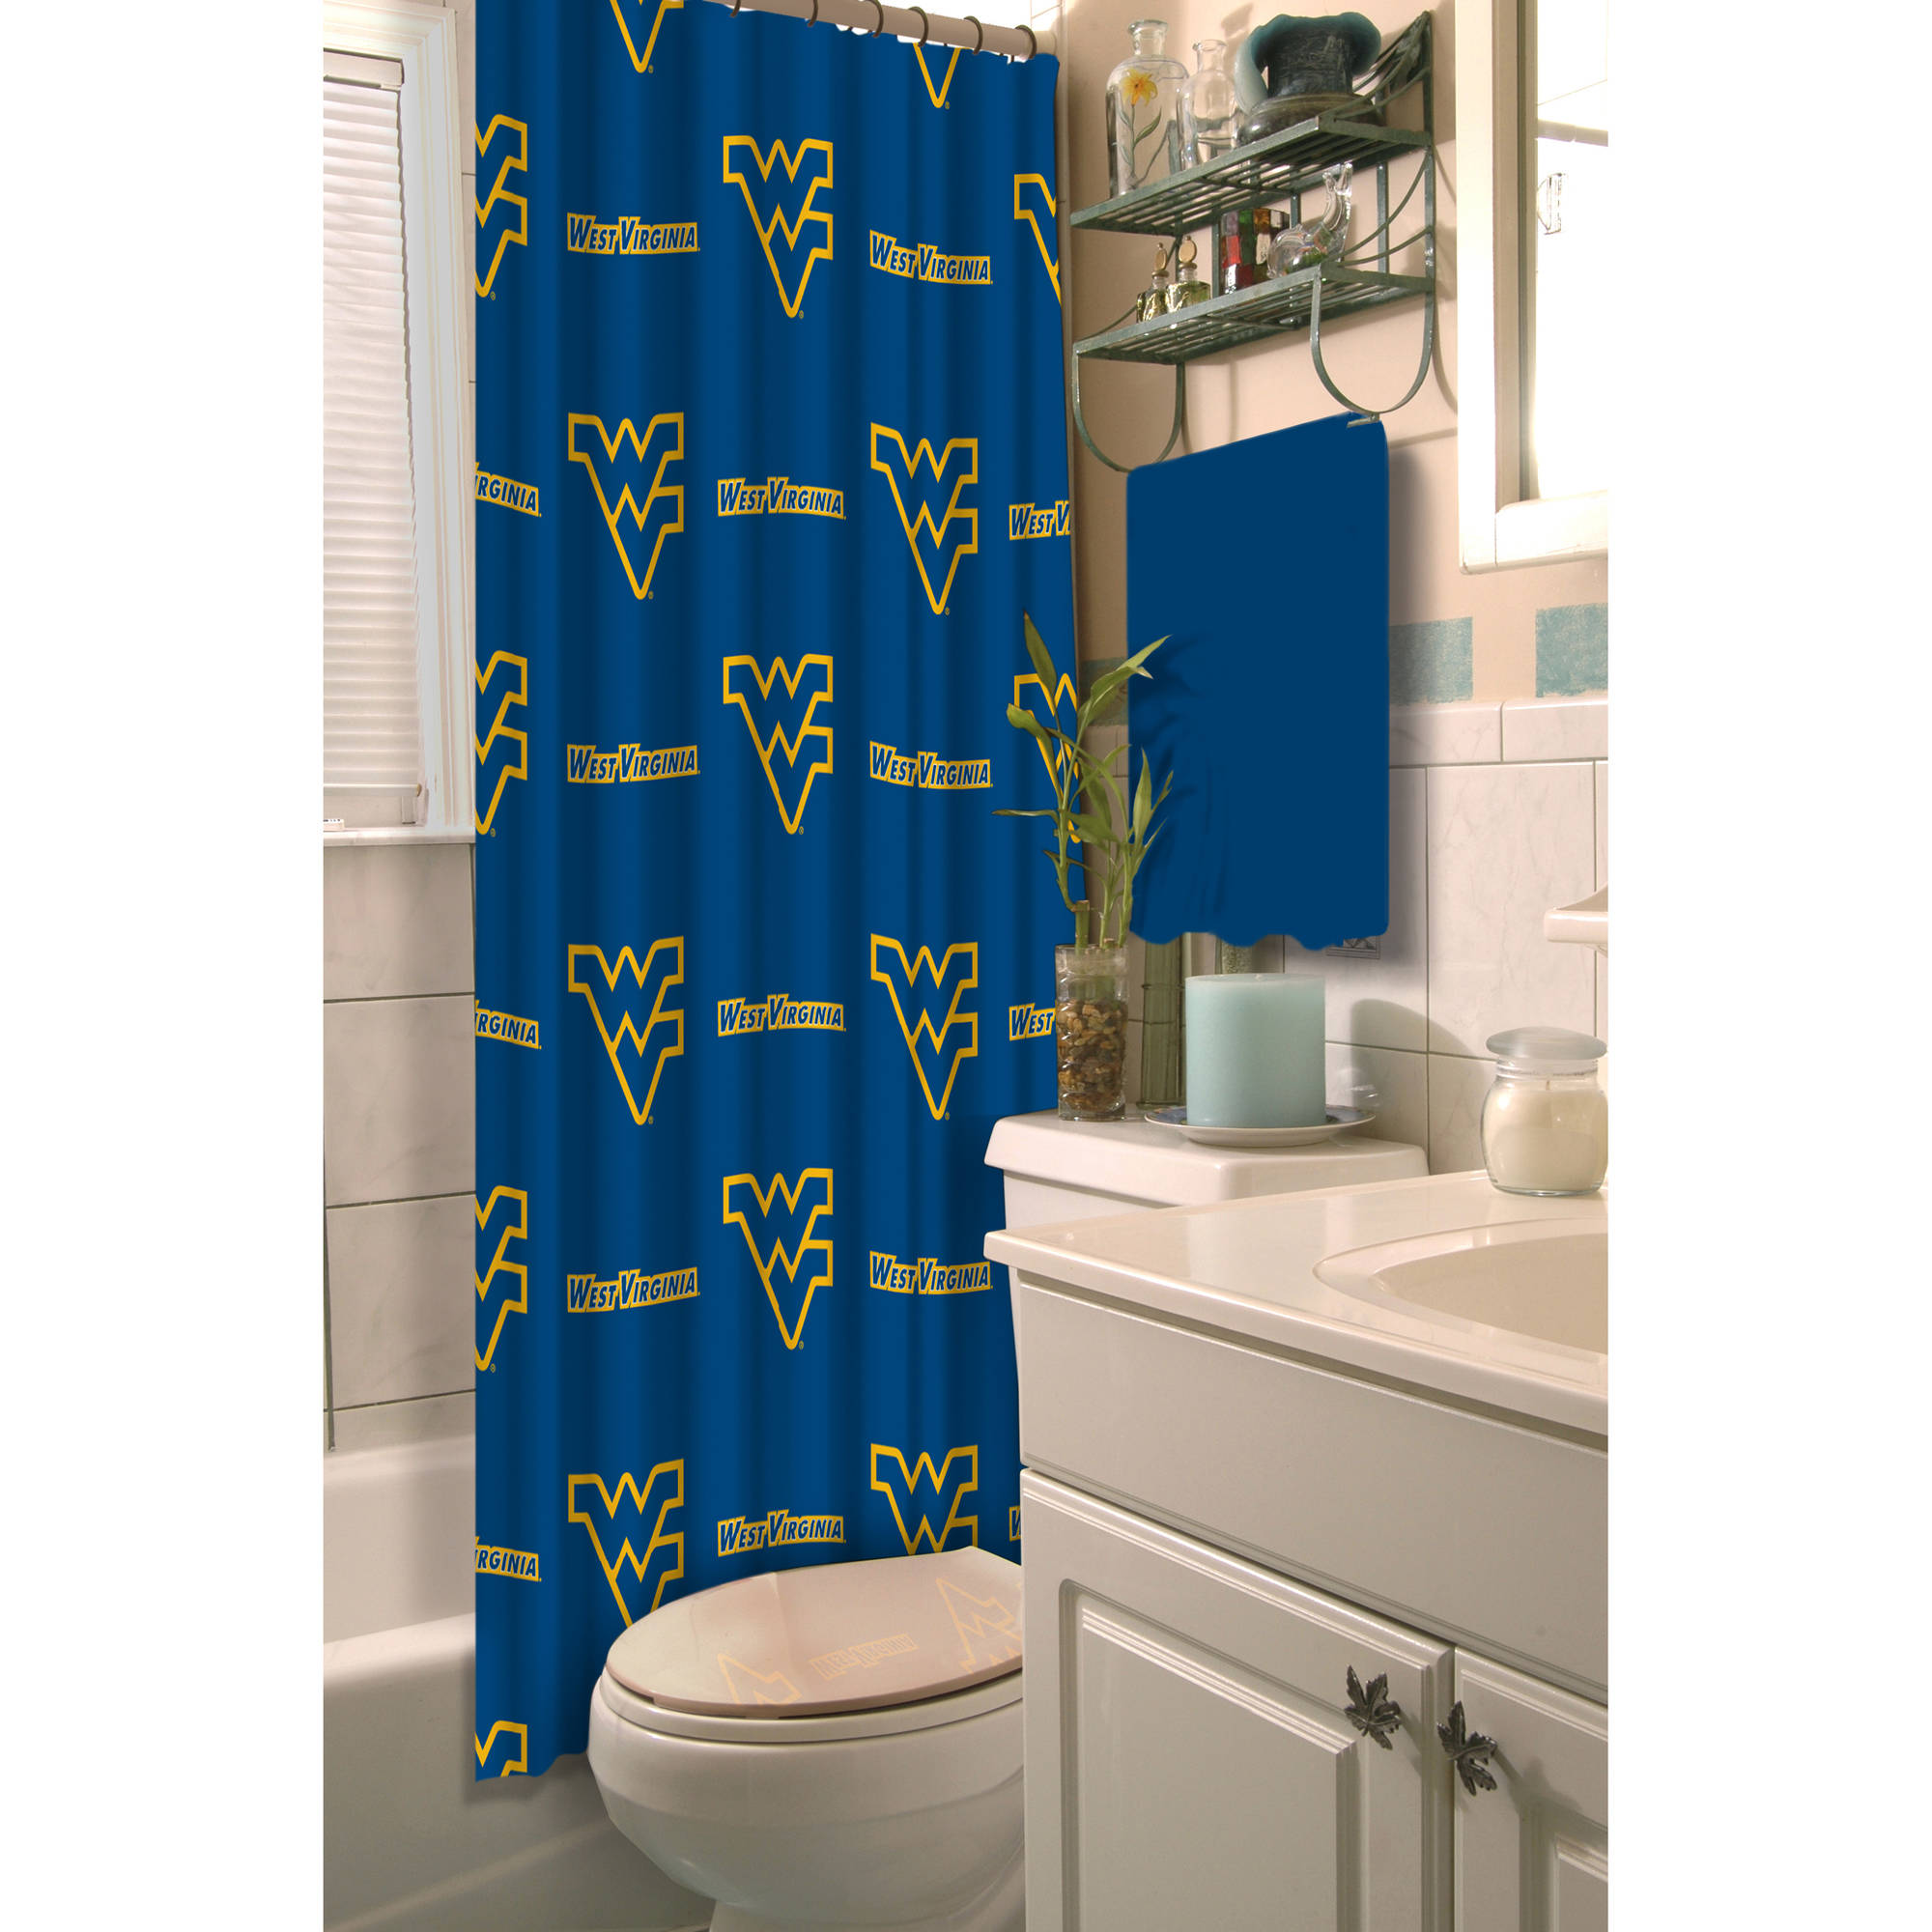 NCAA University of West Virginia Decorative Bath Collection - Shower Curtain